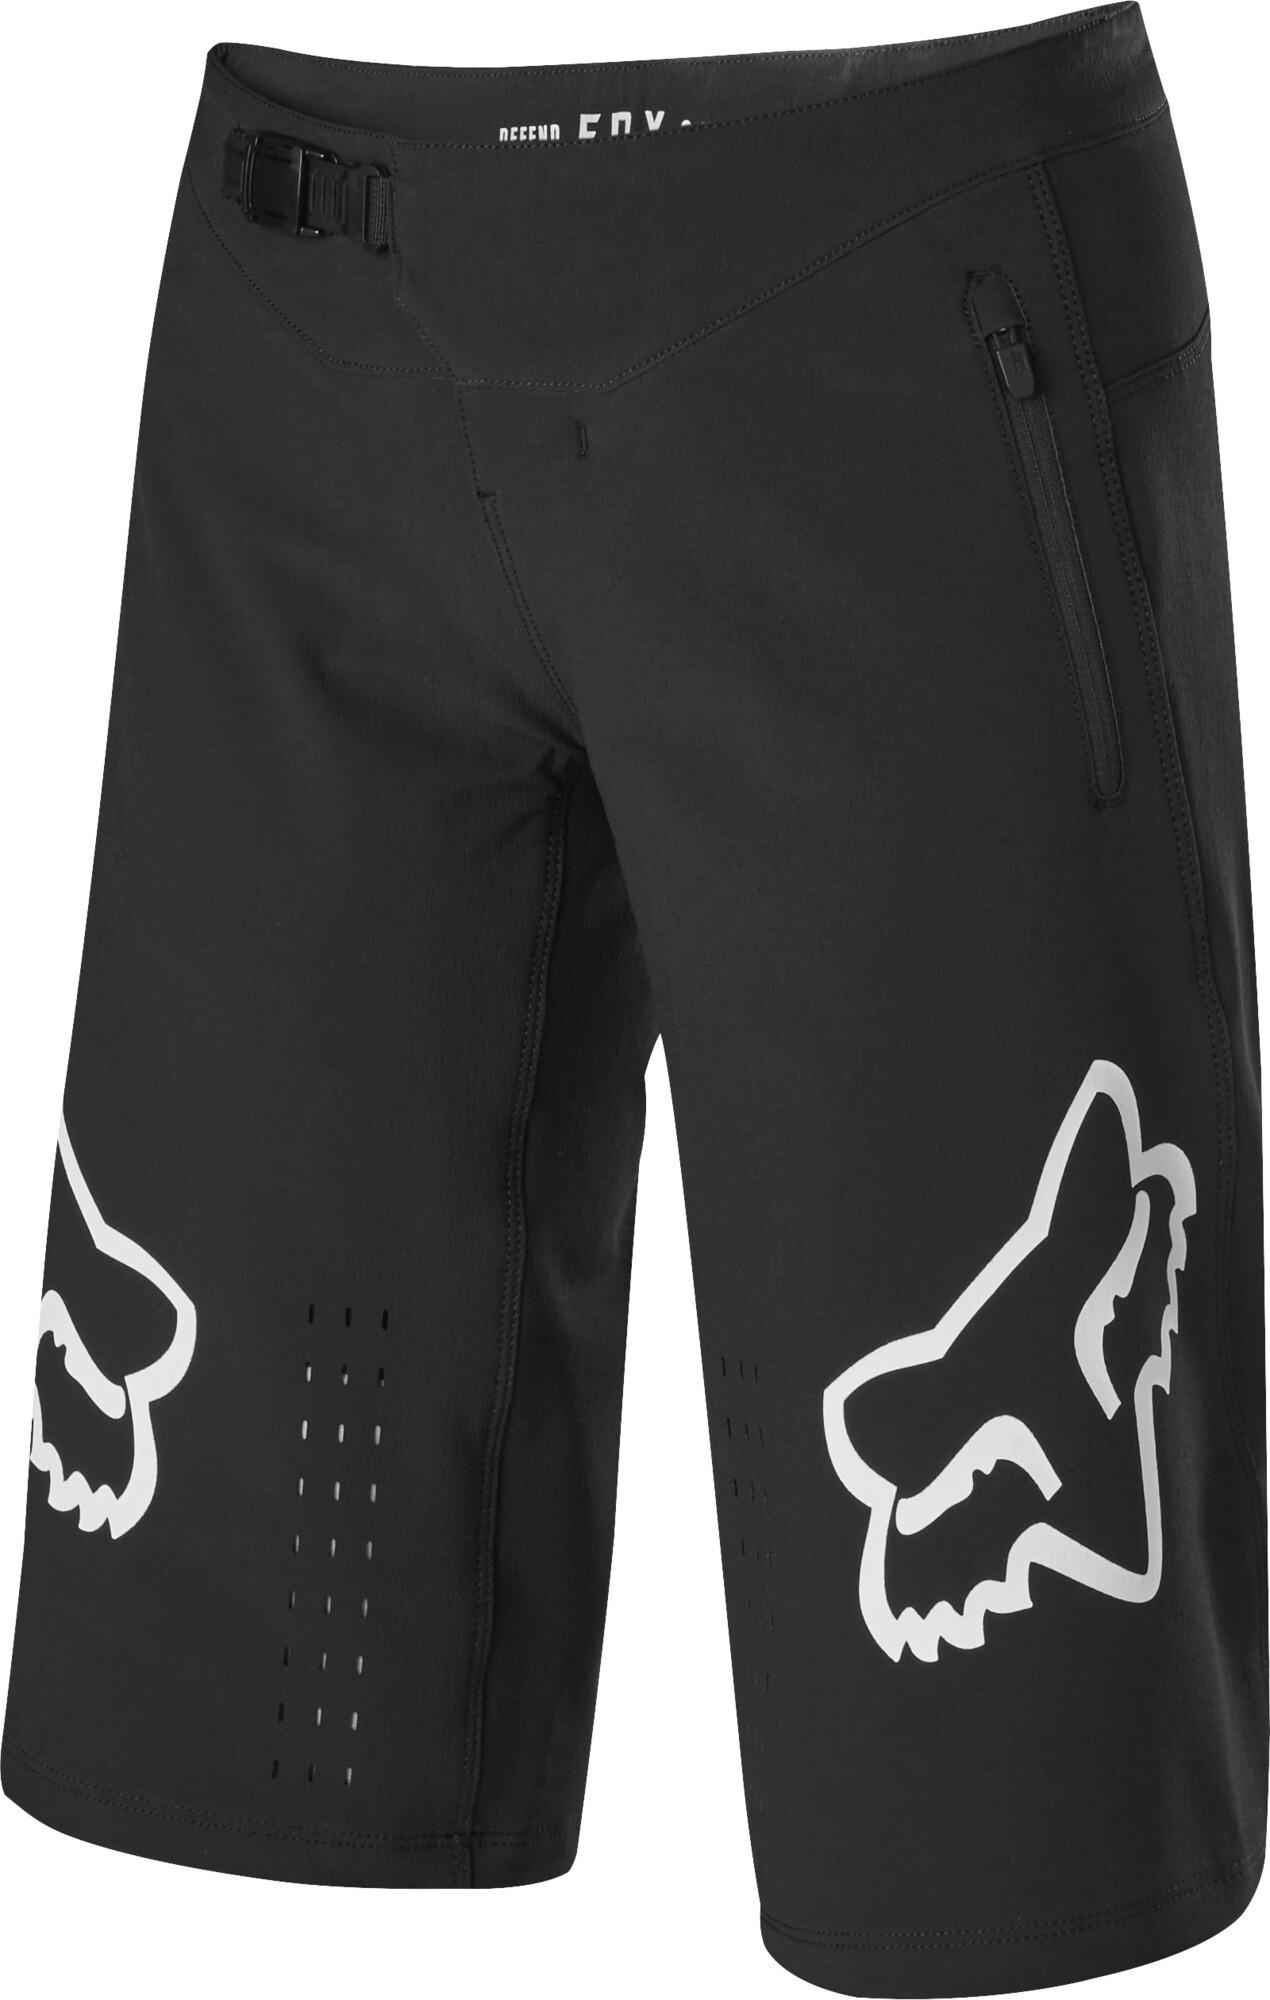 G-Form Unisex X G Pro-X Kompression Shorts-Black//gelb